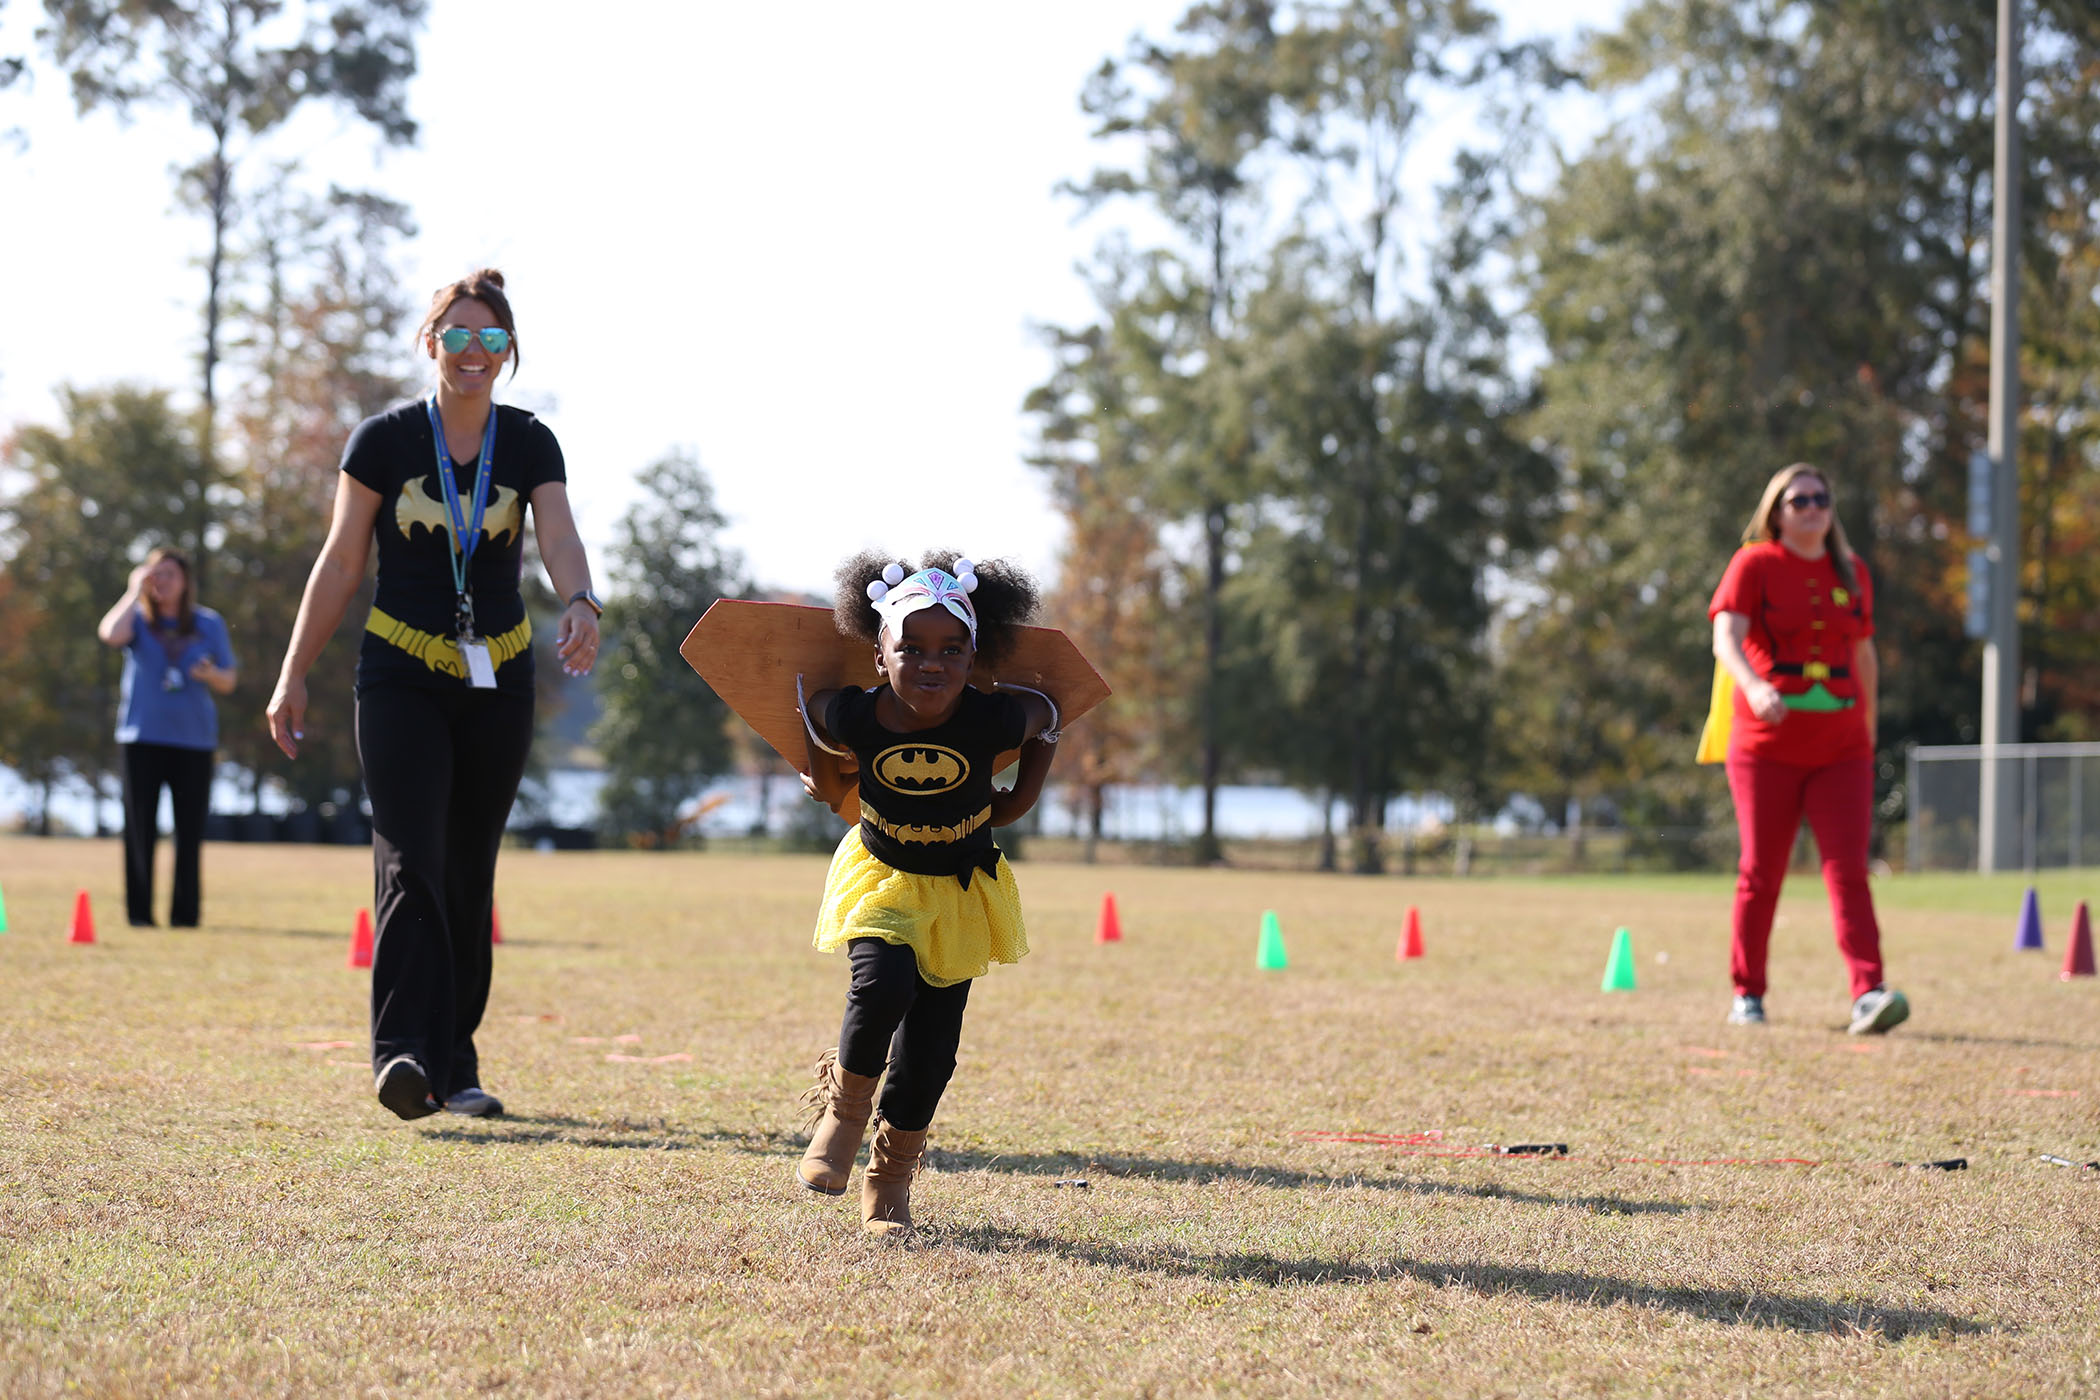 A QLE student participates in the QLE Fun Run.